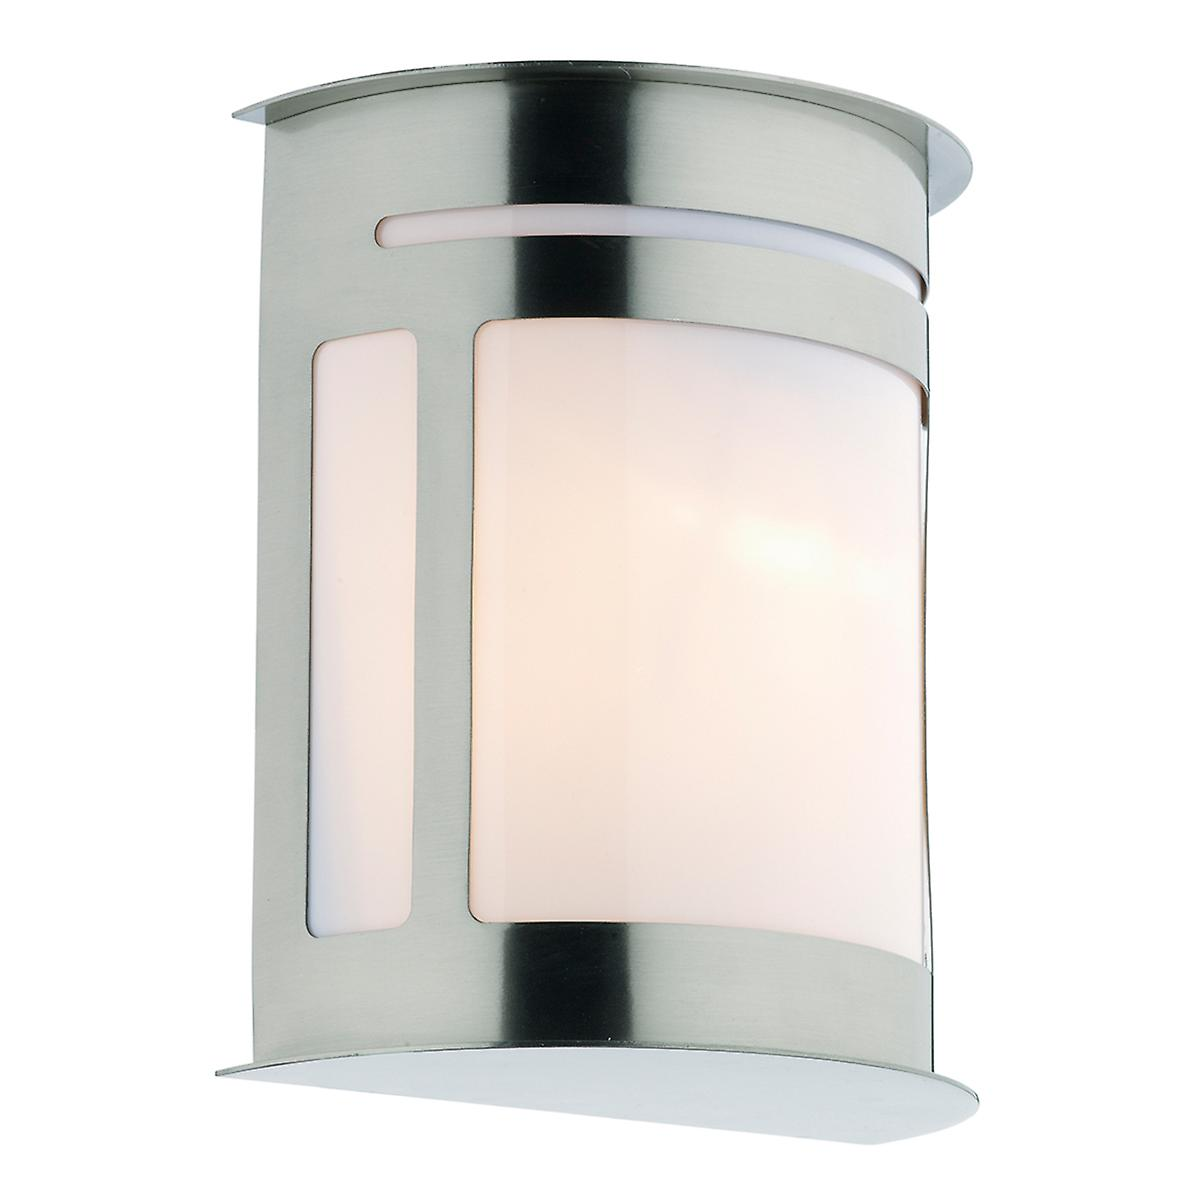 Dar ALU1644 Alumni Modern Oval Outdoor Wall Light With Opal Diffuser - Ip44